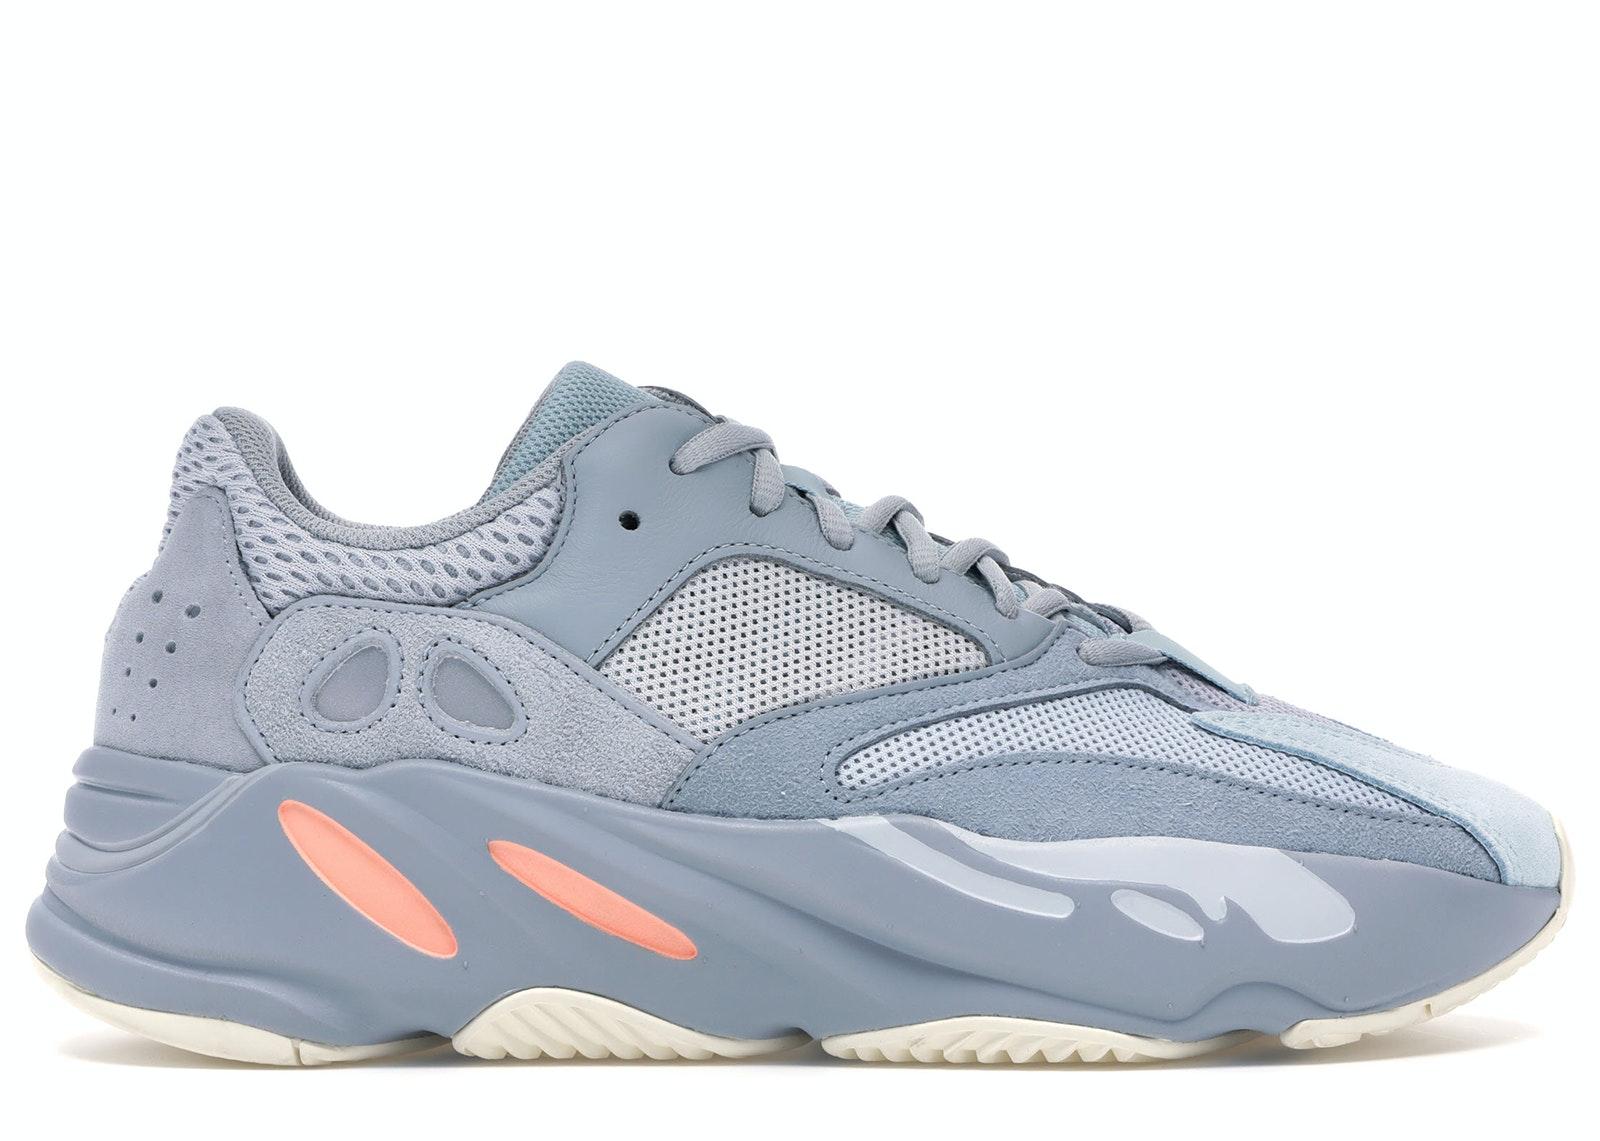 adidas Yeezy Boost 700 Inertia - EG7597